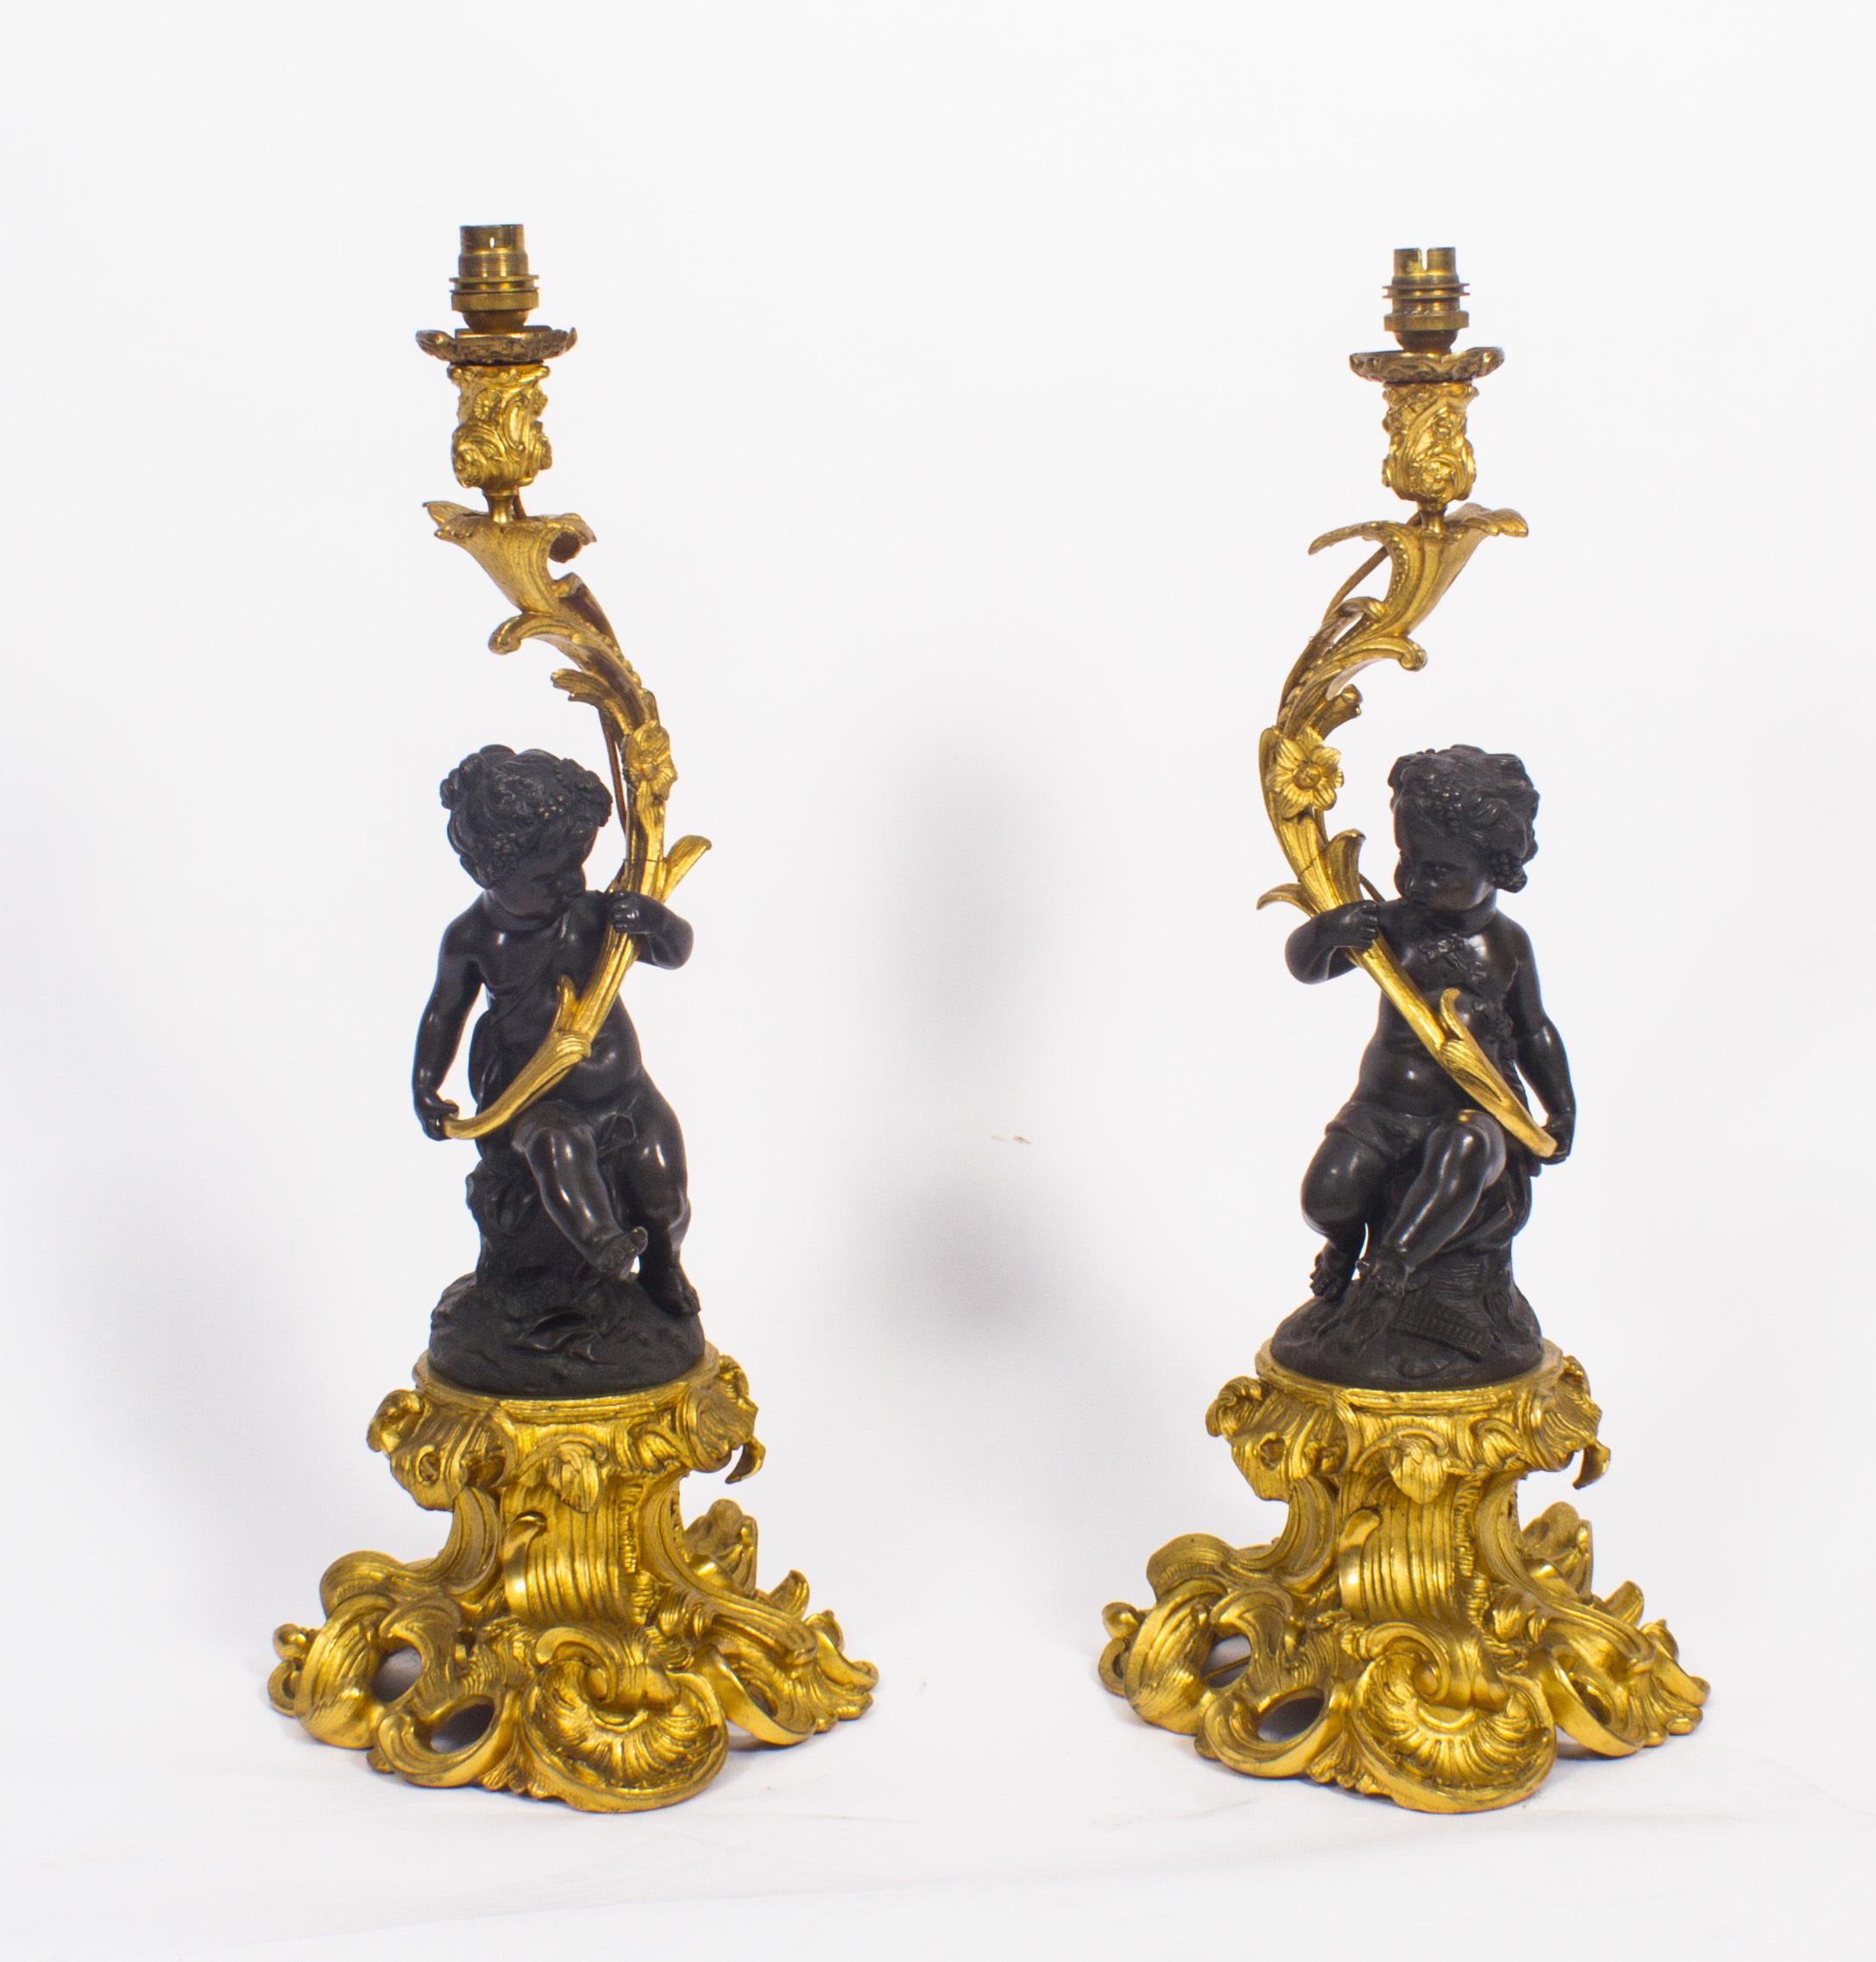 Antique Pair French Ormolu Patinated Bronze Cherubs Table Lamps 19th C Vinterior